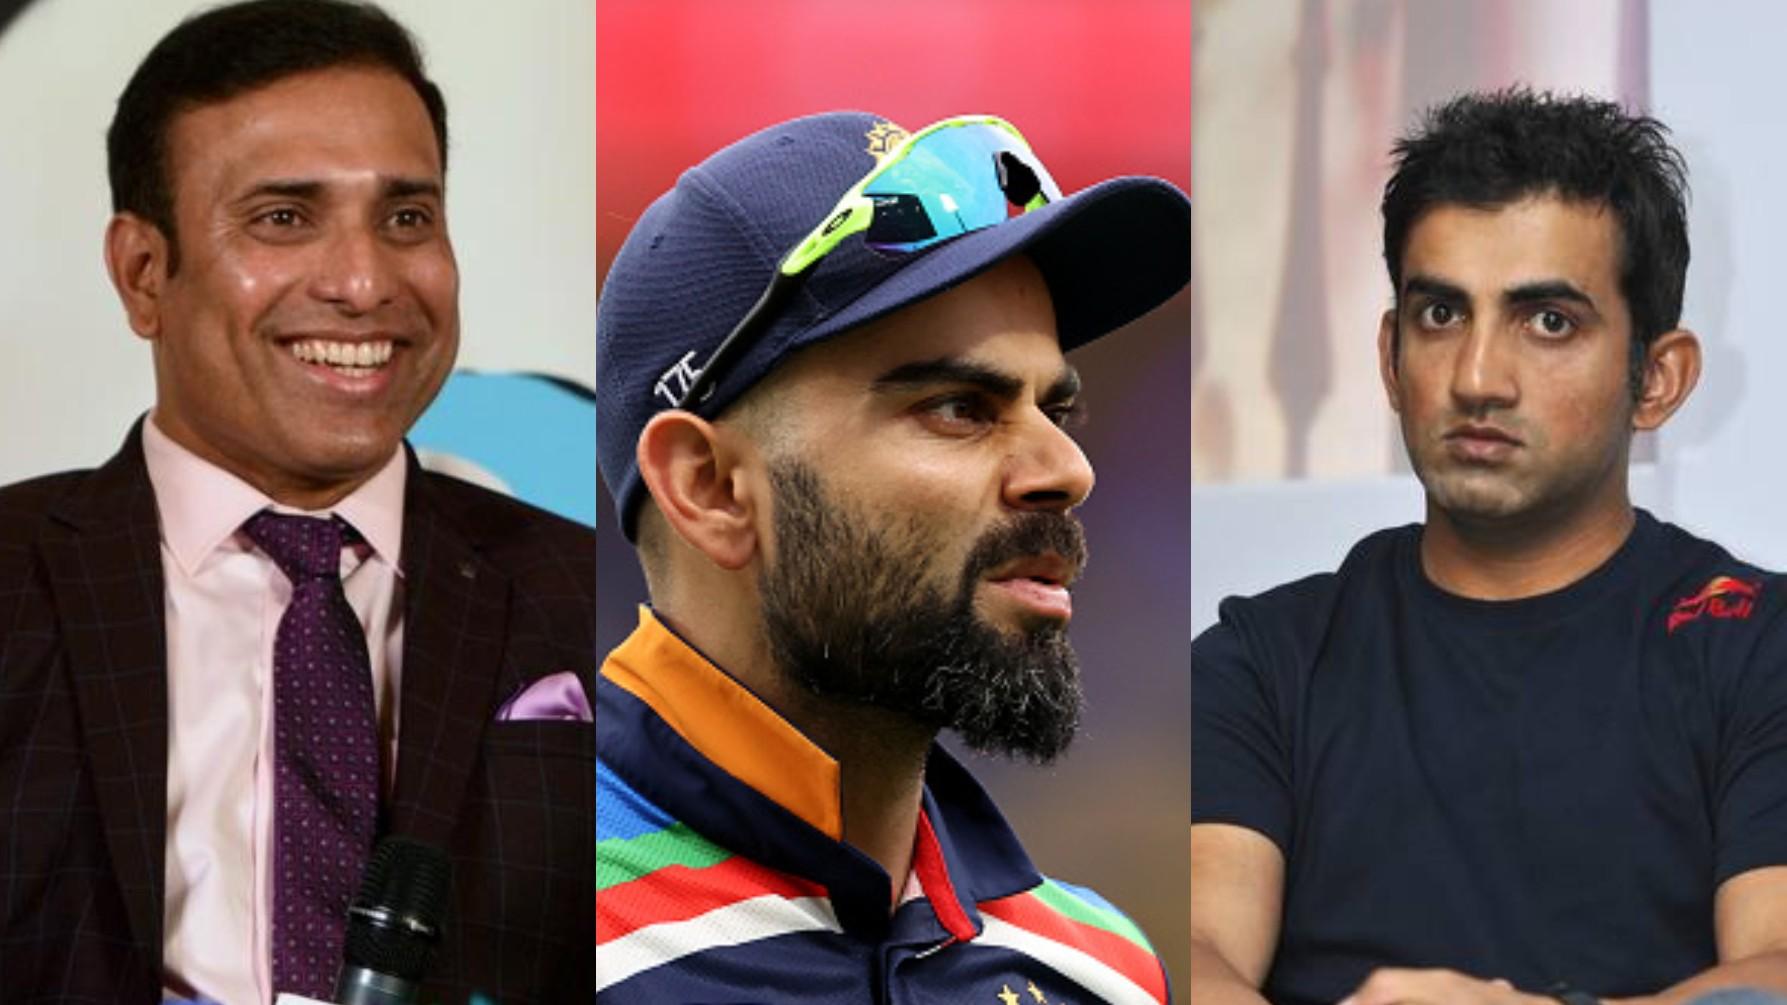 AUS v IND 2020-21: Laxman and Gambhir laud Kohli for his 'phenomenal' run after completing 12,000 ODI runs